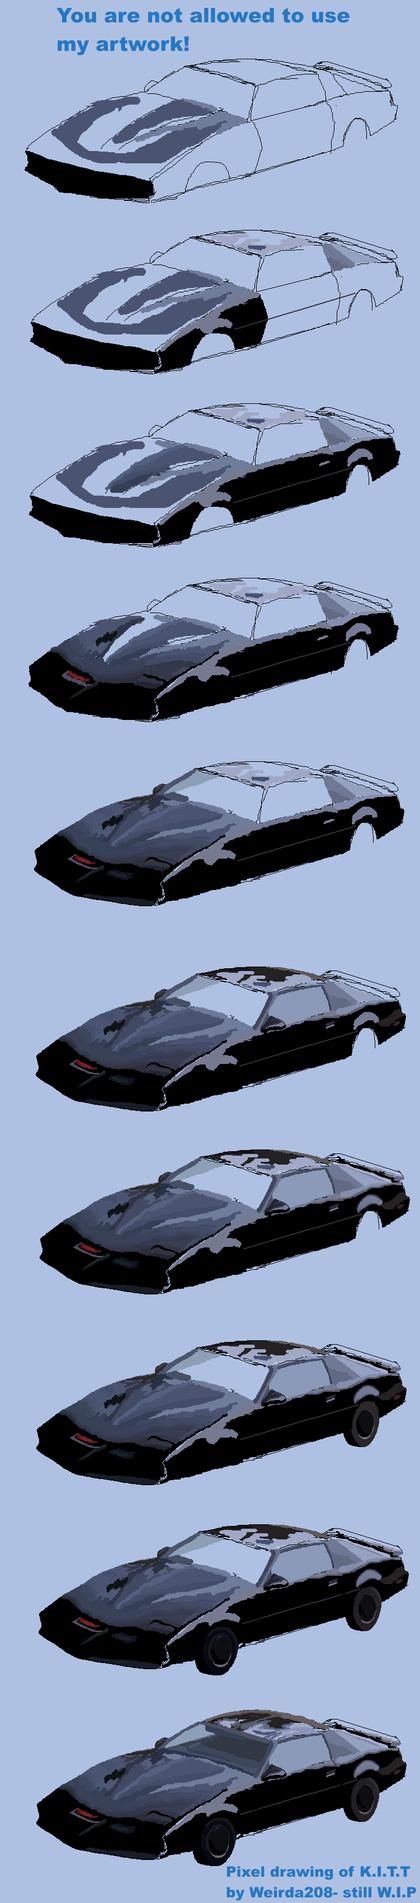 Pixel K.I.T.T- progress of broken work by Weirda208